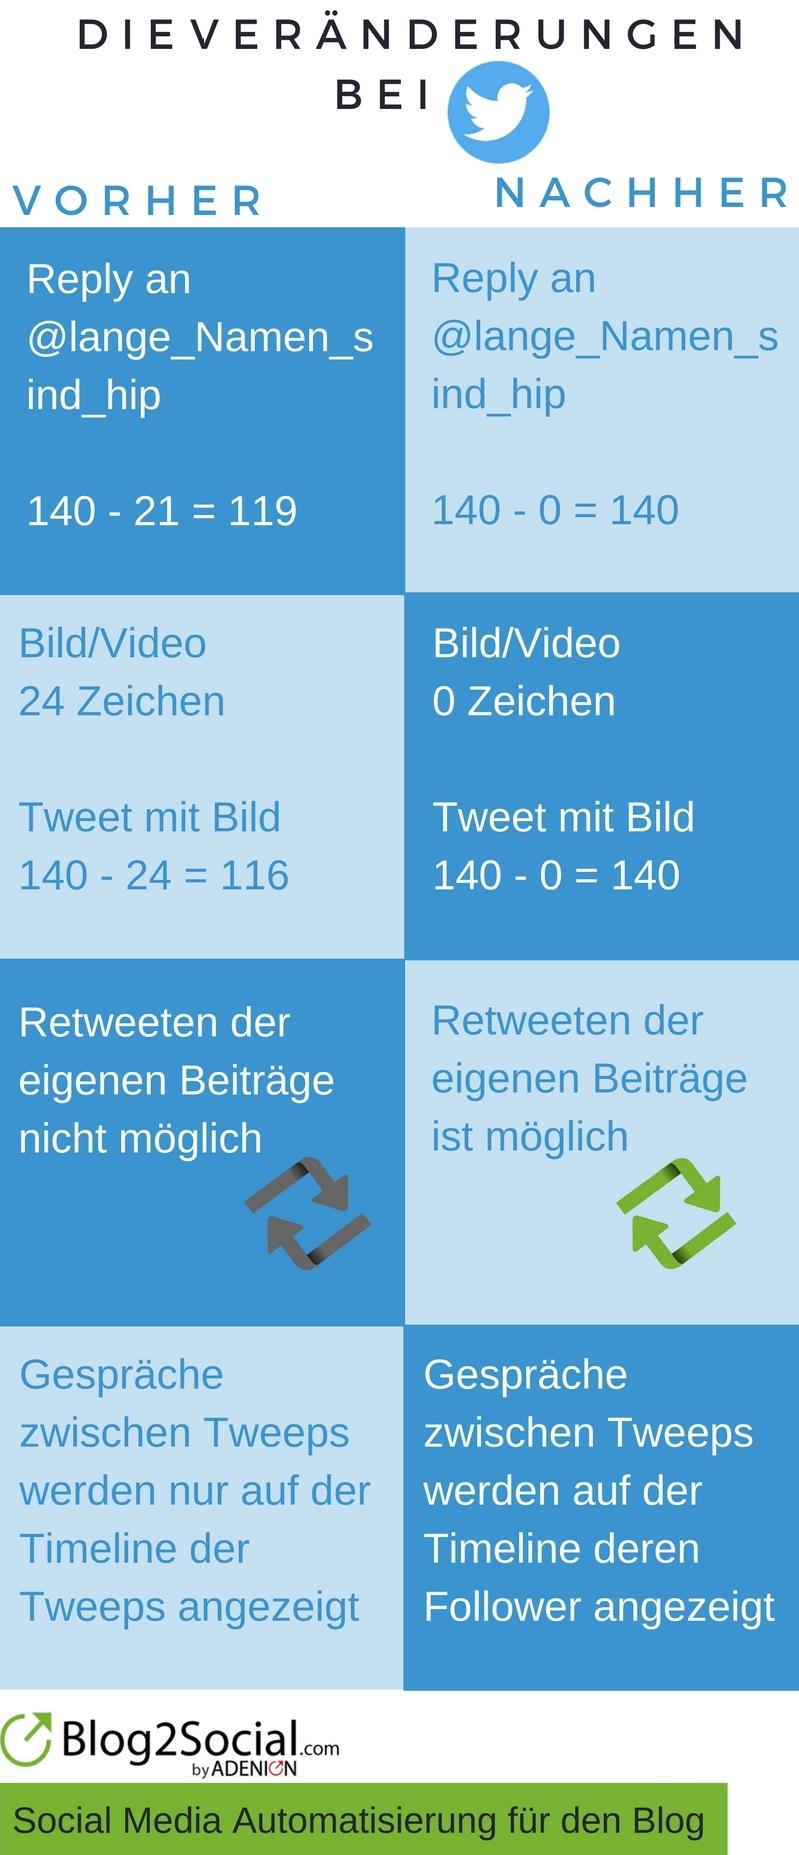 infografik_veraenderungen_bei_twitter